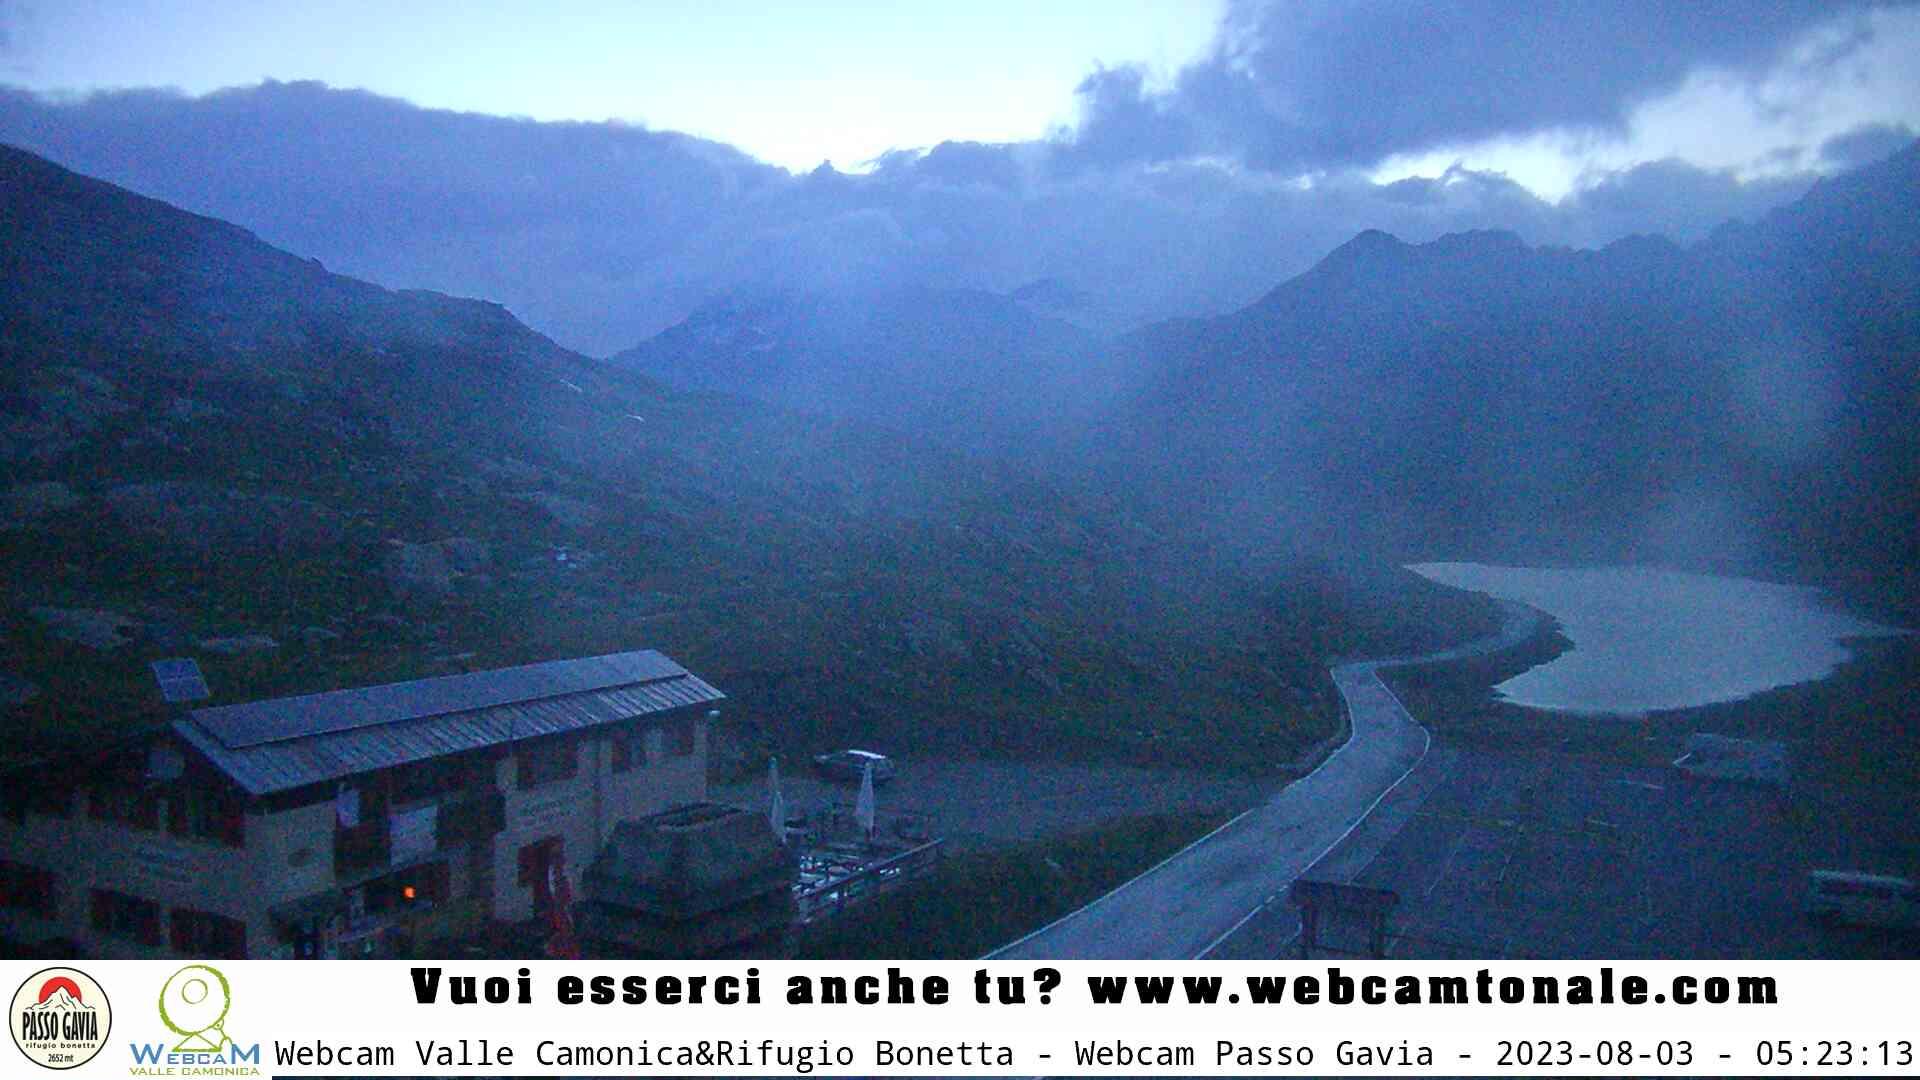 Webcamvallecamonica copyright